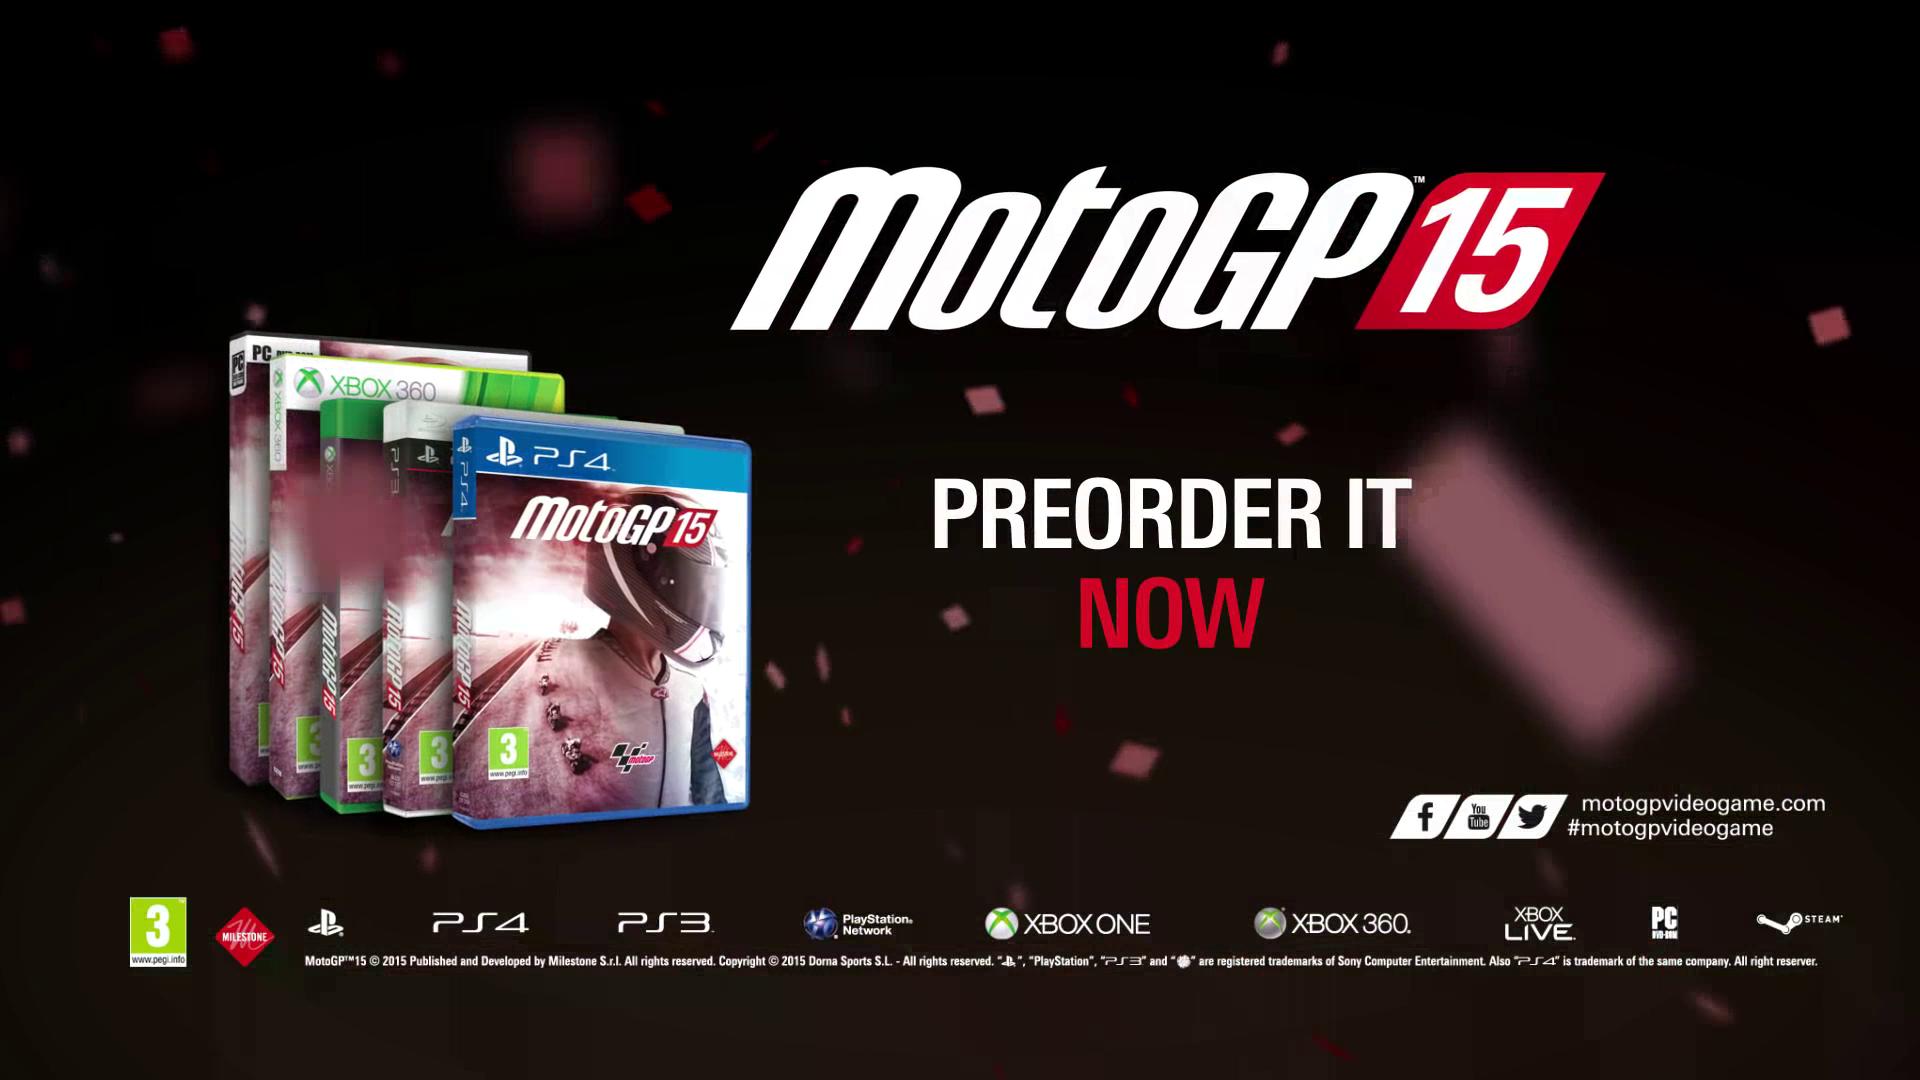 Motogp 14 Ps4 Pre Order | MotoGP 2017 Info, Video, Points Table